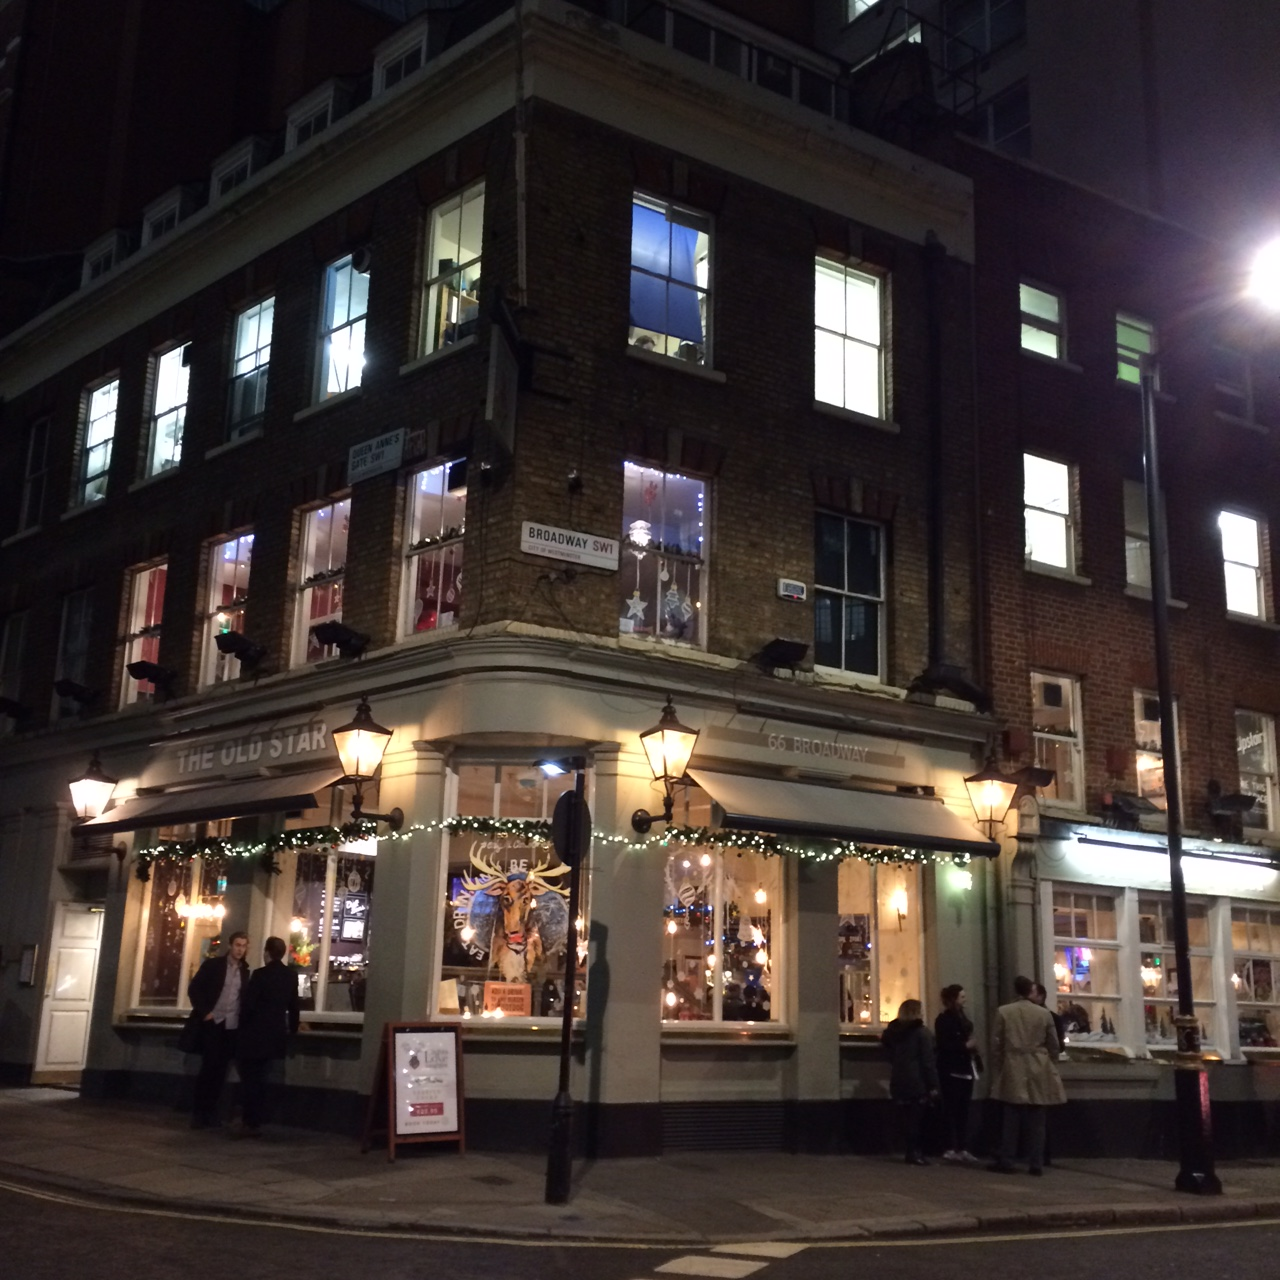 W pub night